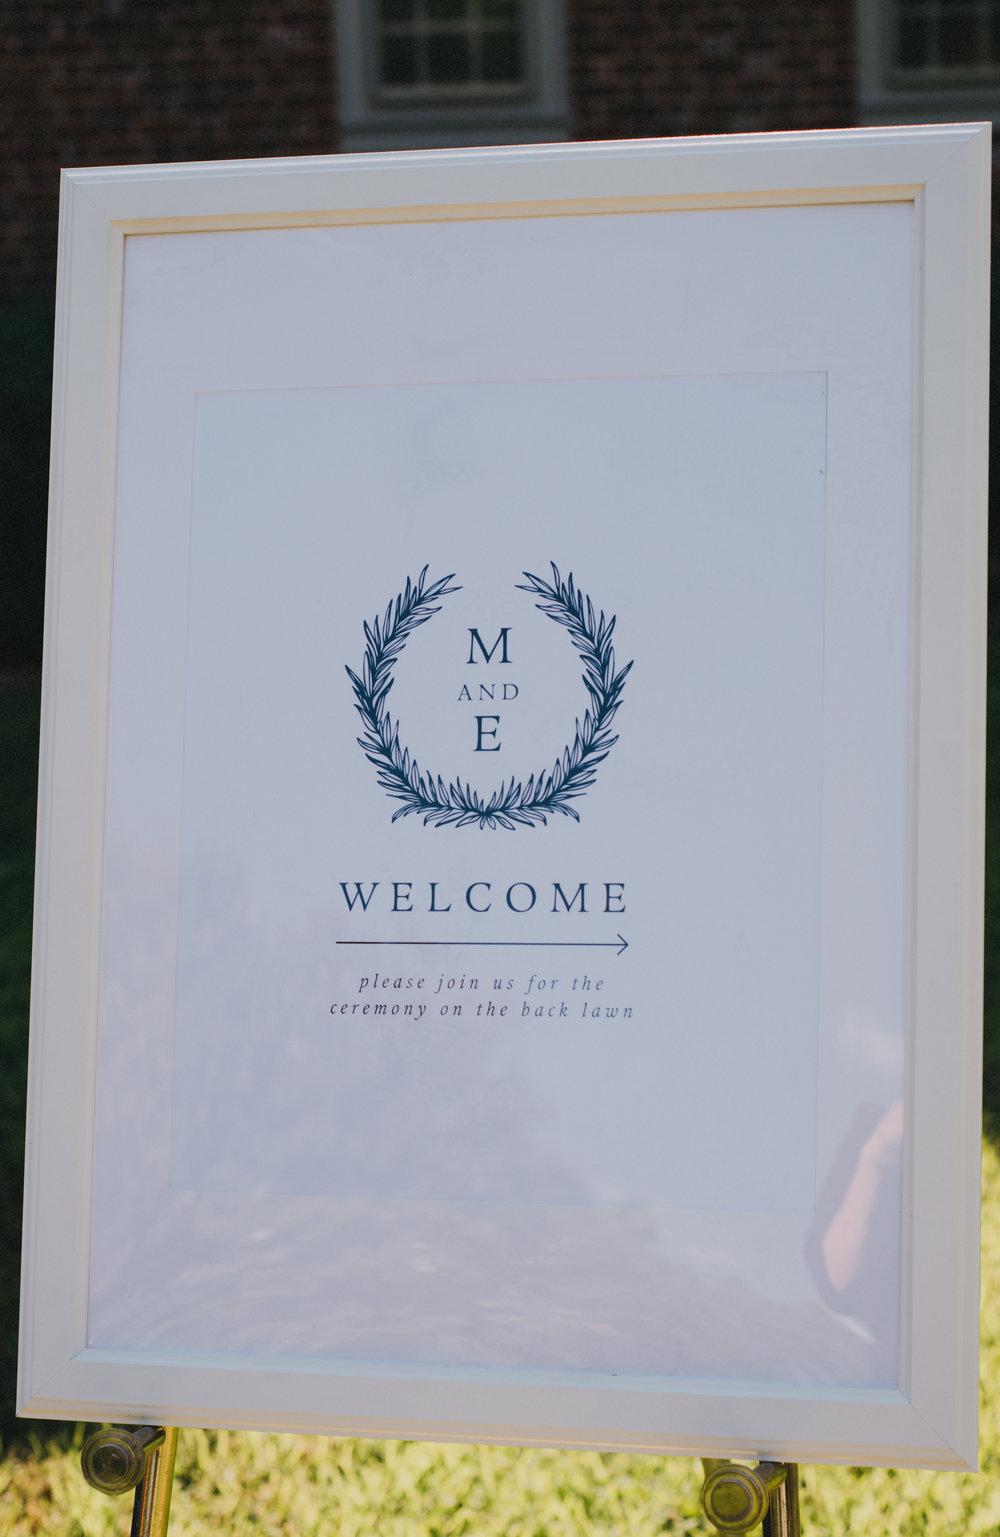 M&E-0395.jpg